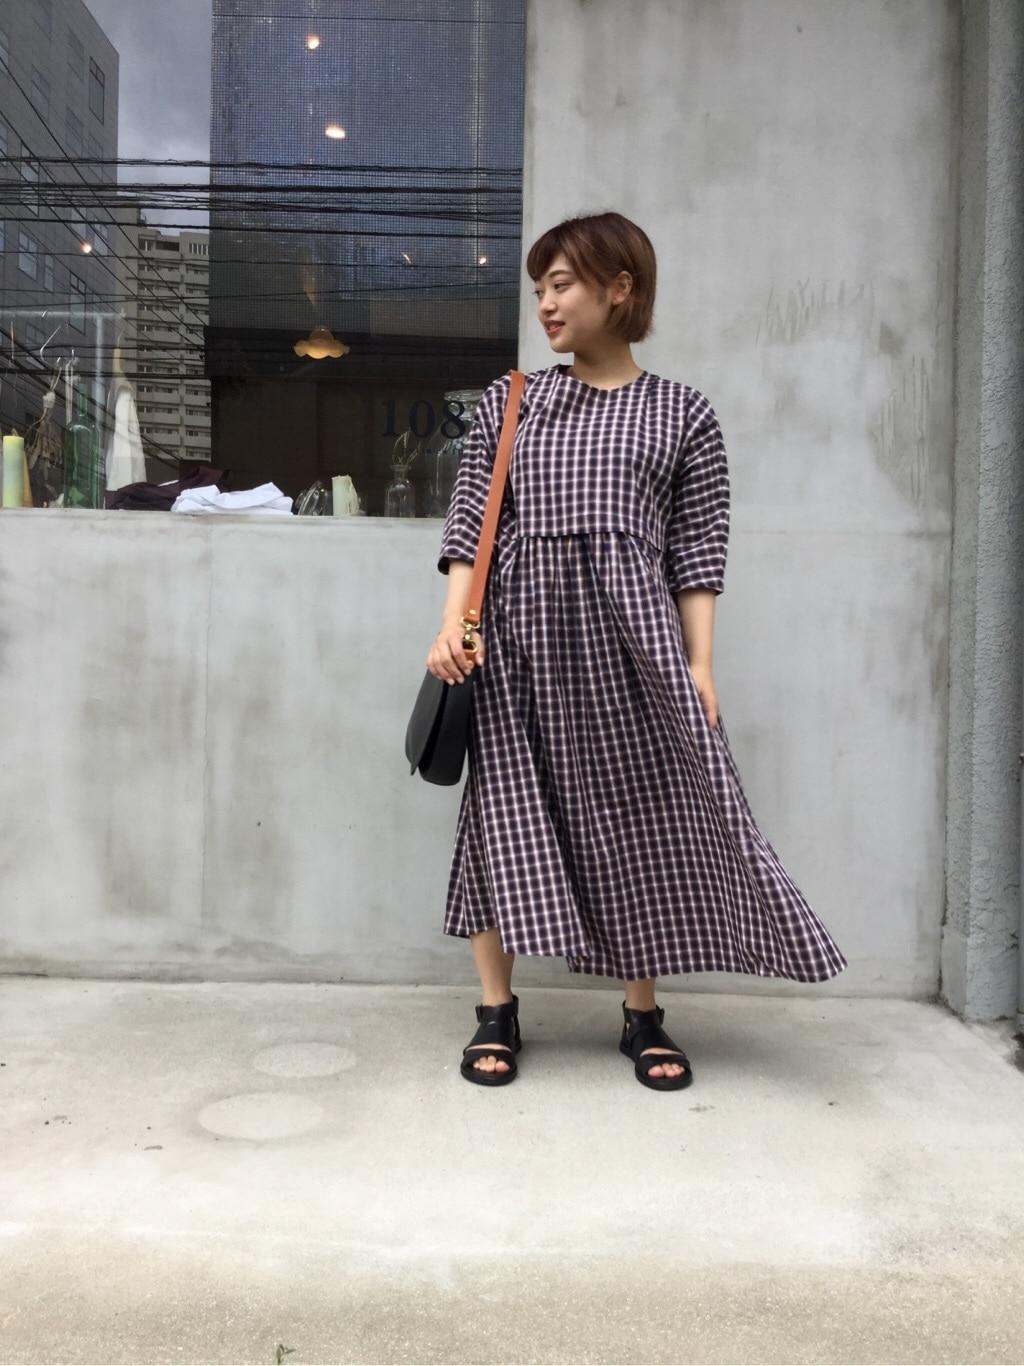 108 yuni / bulle de savon 福岡薬院路面 身長:150cm 2019.07.23